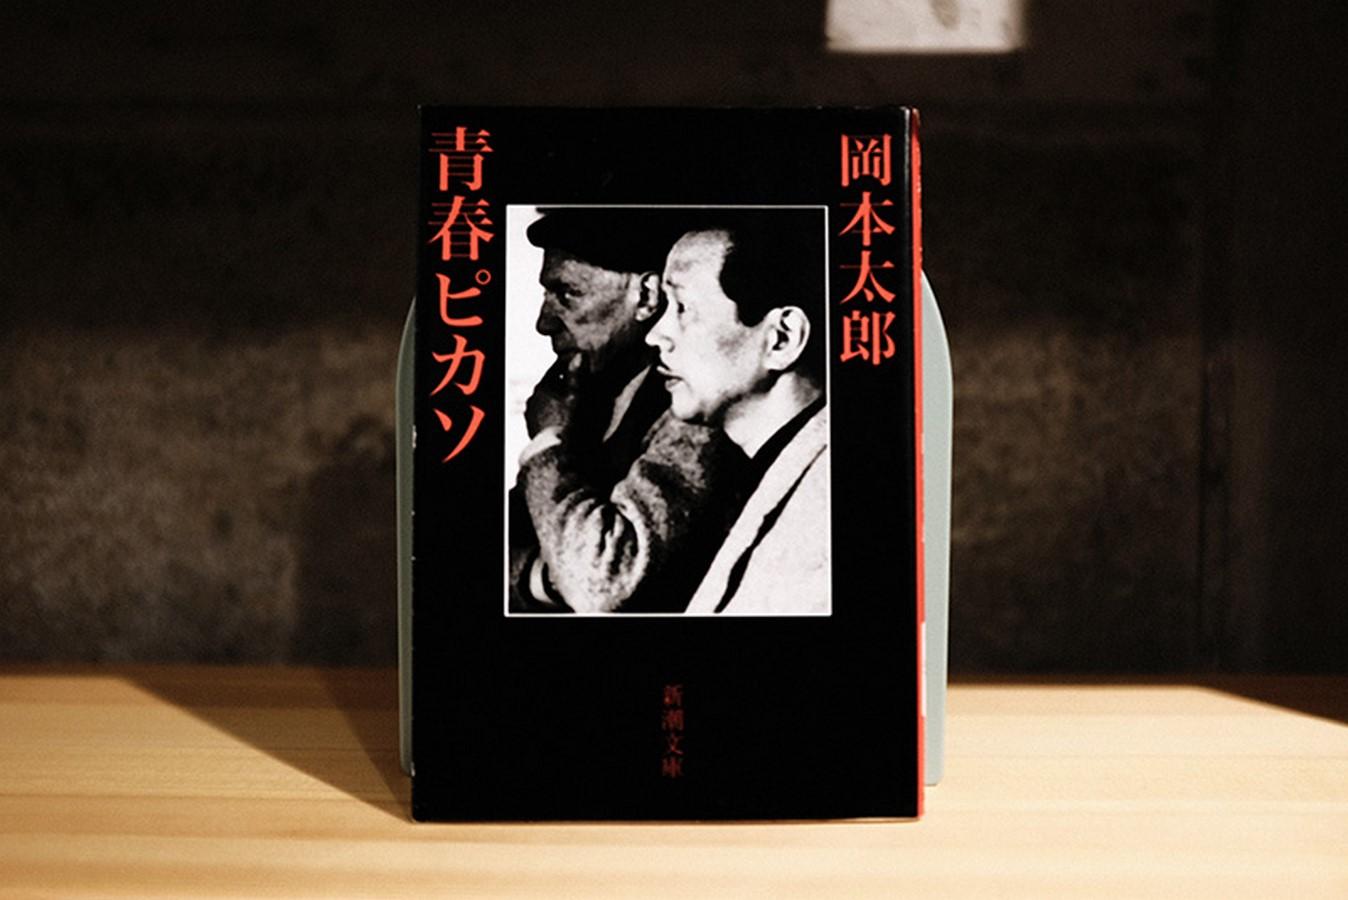 Tarō Okamoto- 10 Iconic Artworks - Sheet3